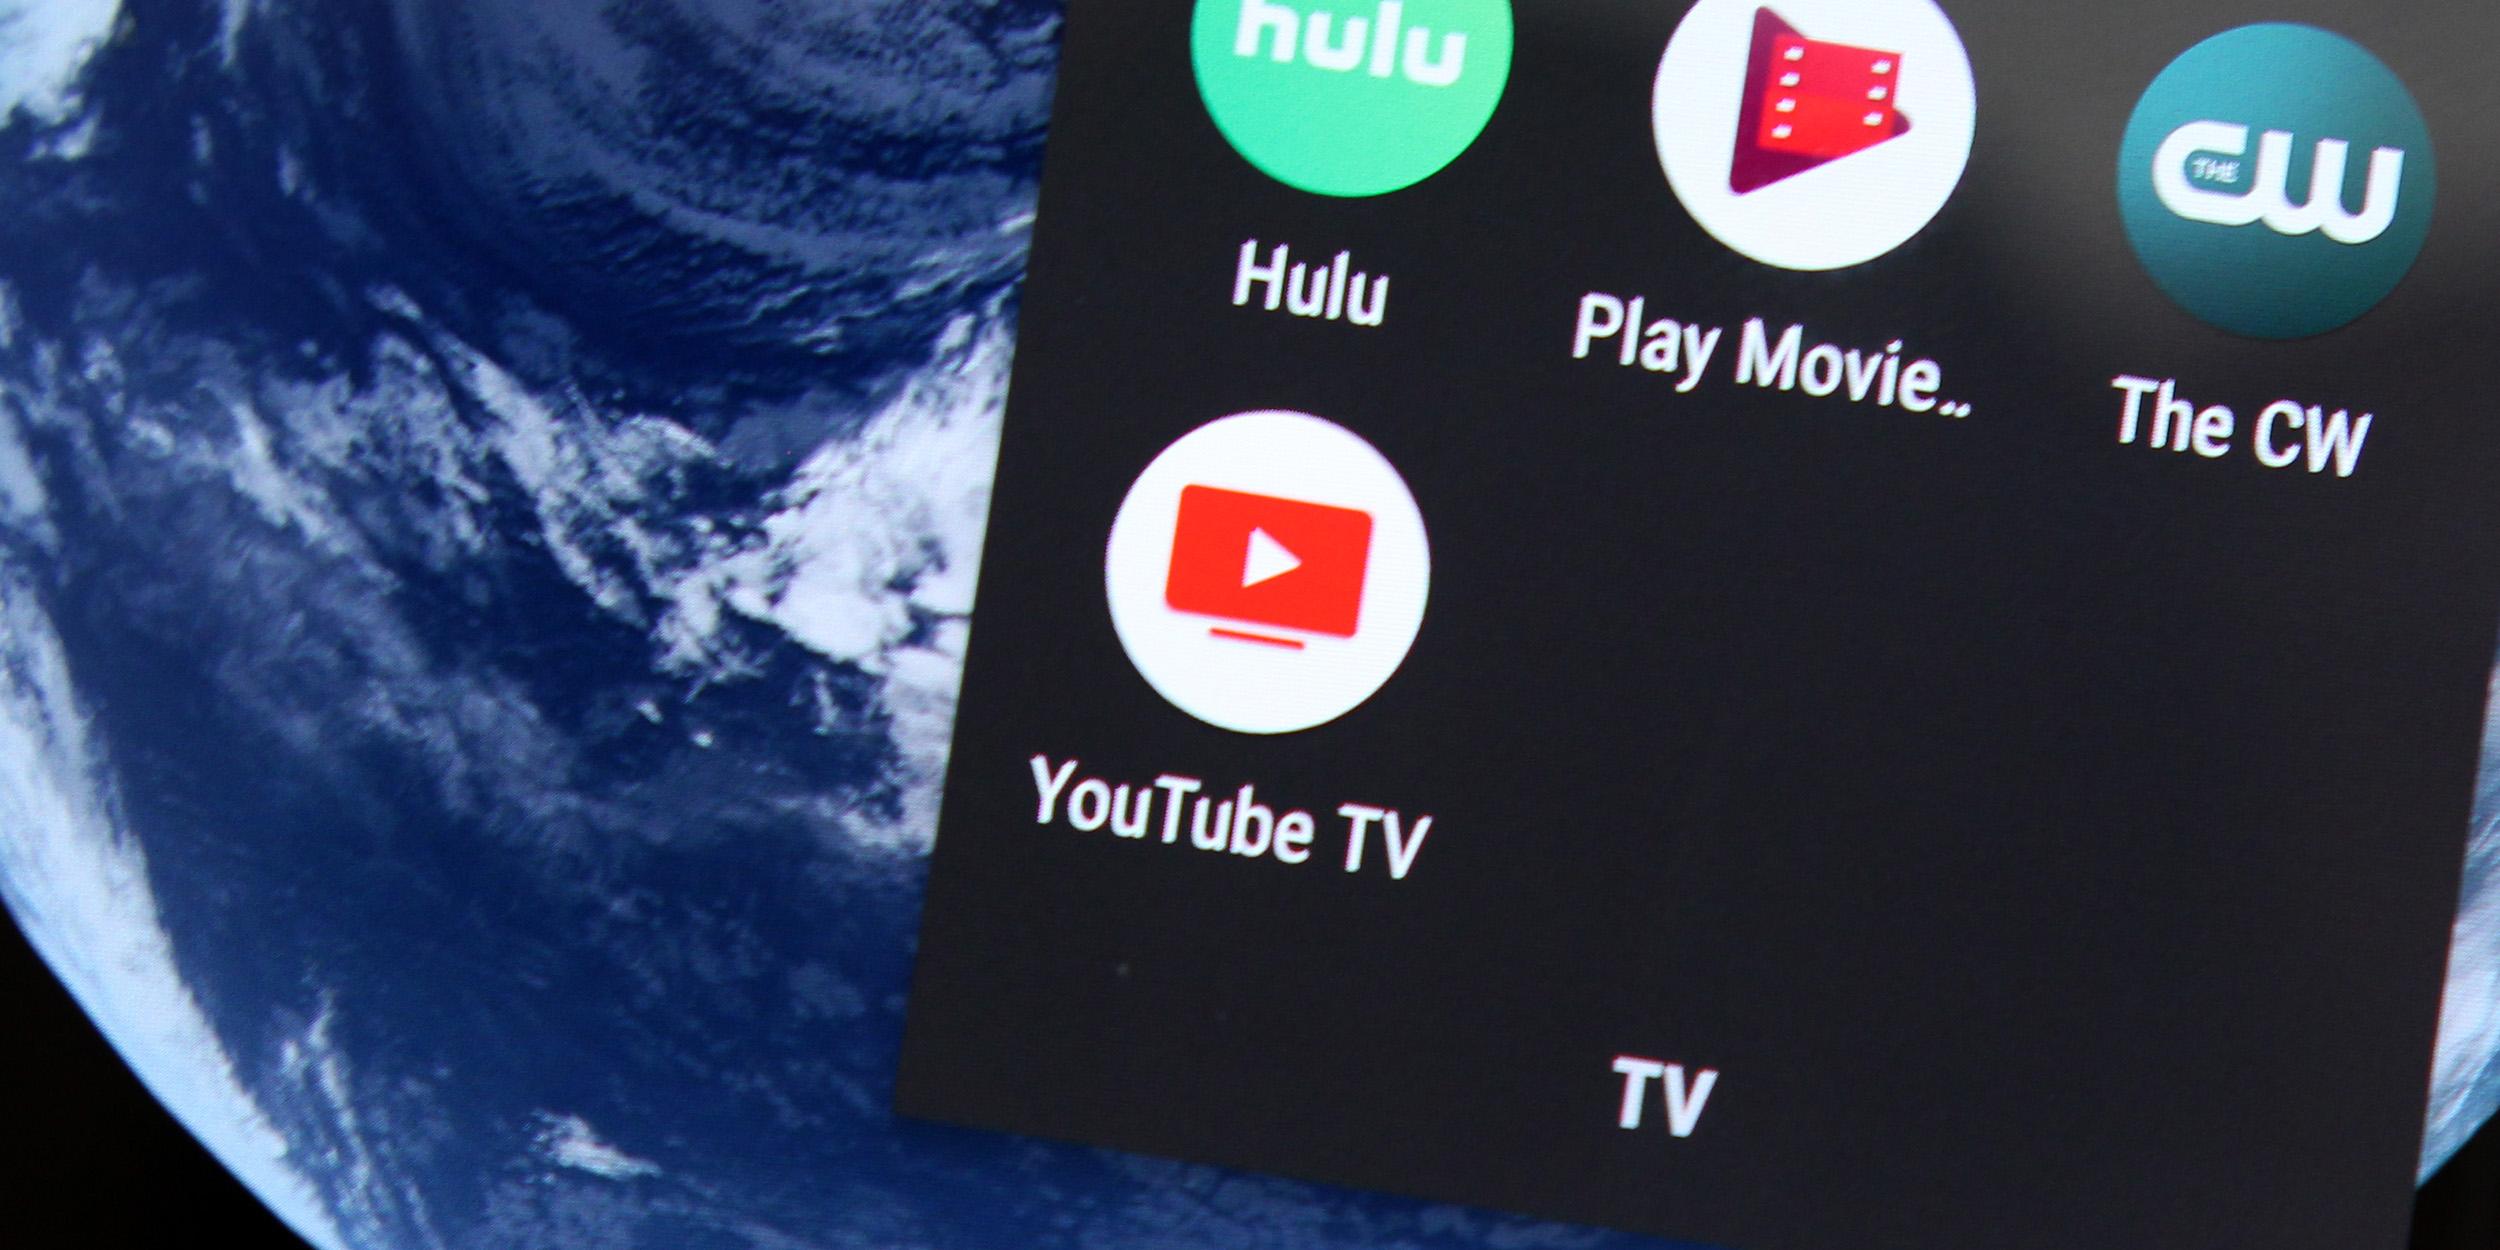 youtube tv promo code 2019